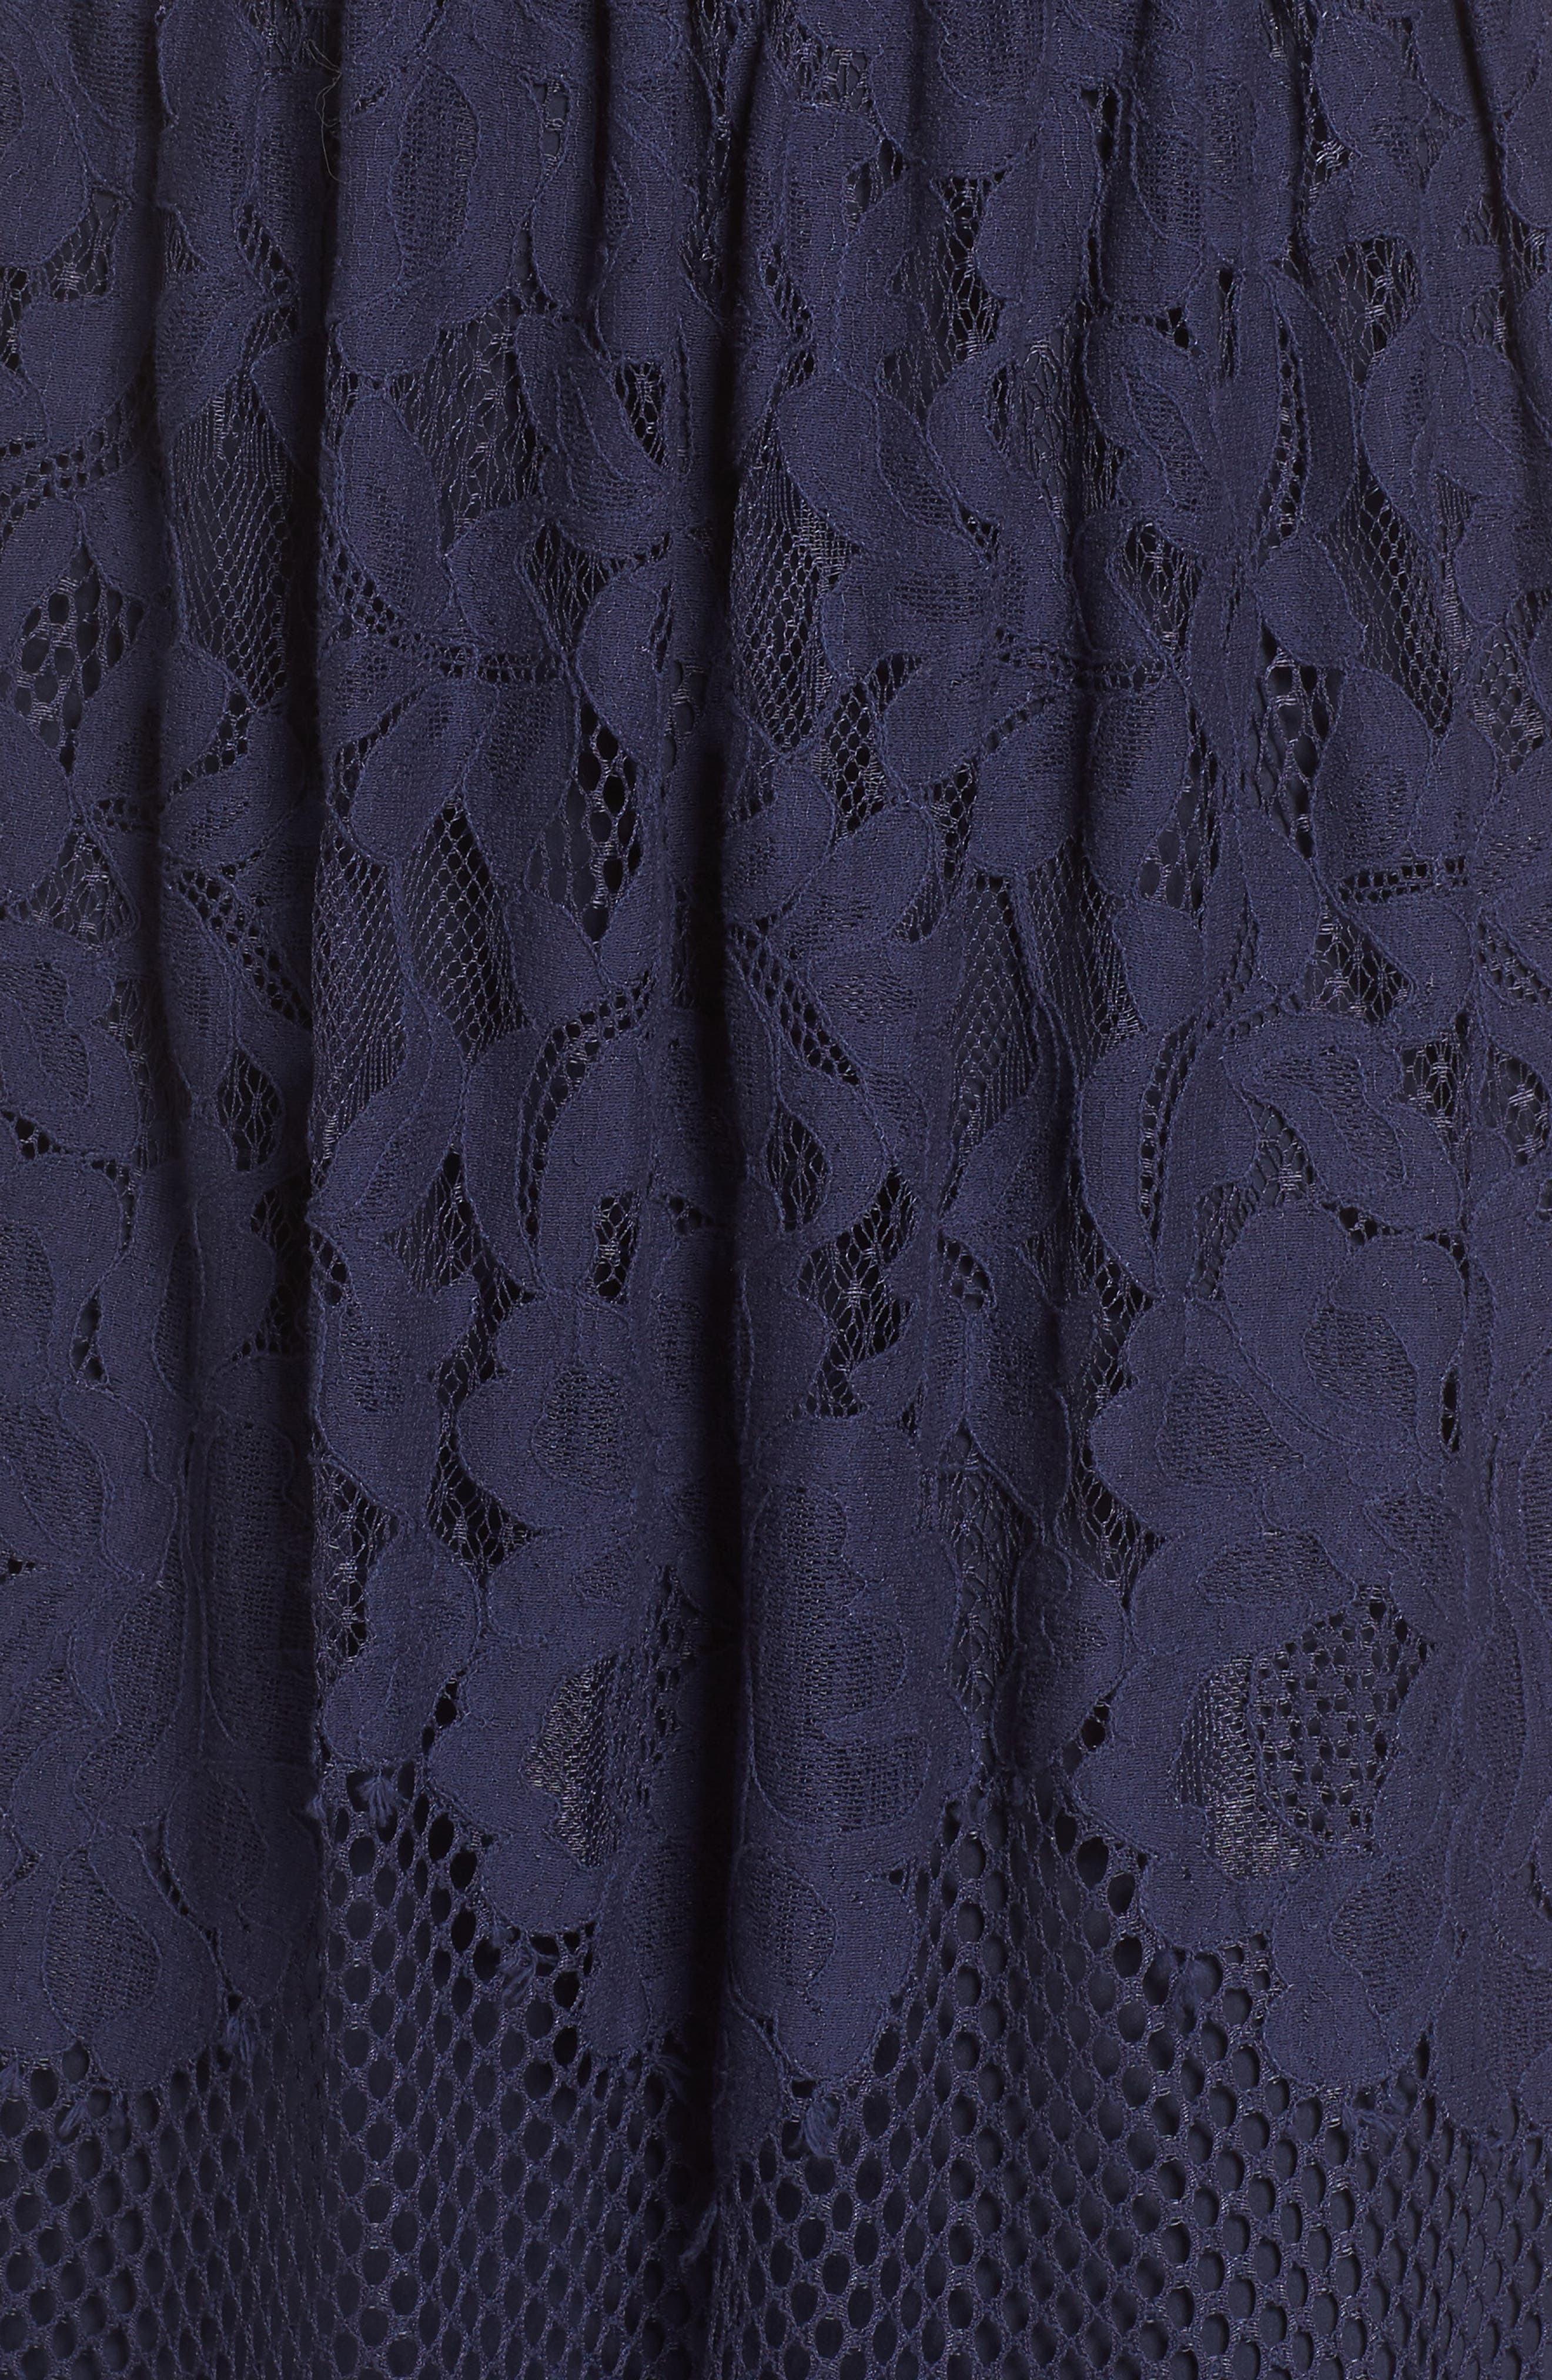 Off the Shoulder Lace Midi Dress,                             Alternate thumbnail 5, color,                             Navy